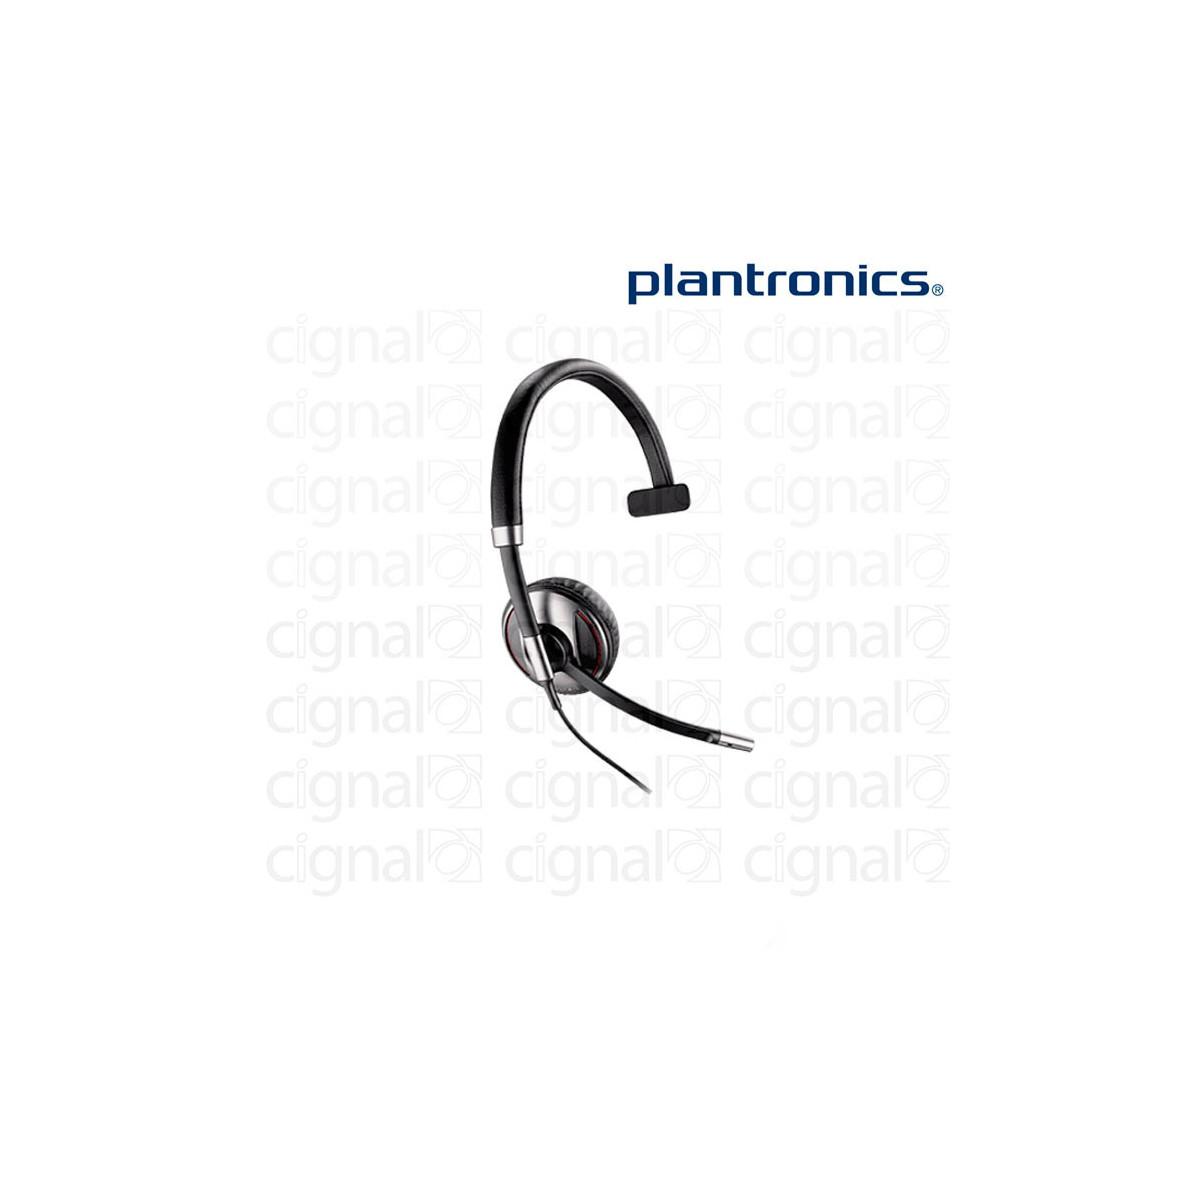 headset usb plantronics blackwire c710 monoaurales. Black Bedroom Furniture Sets. Home Design Ideas